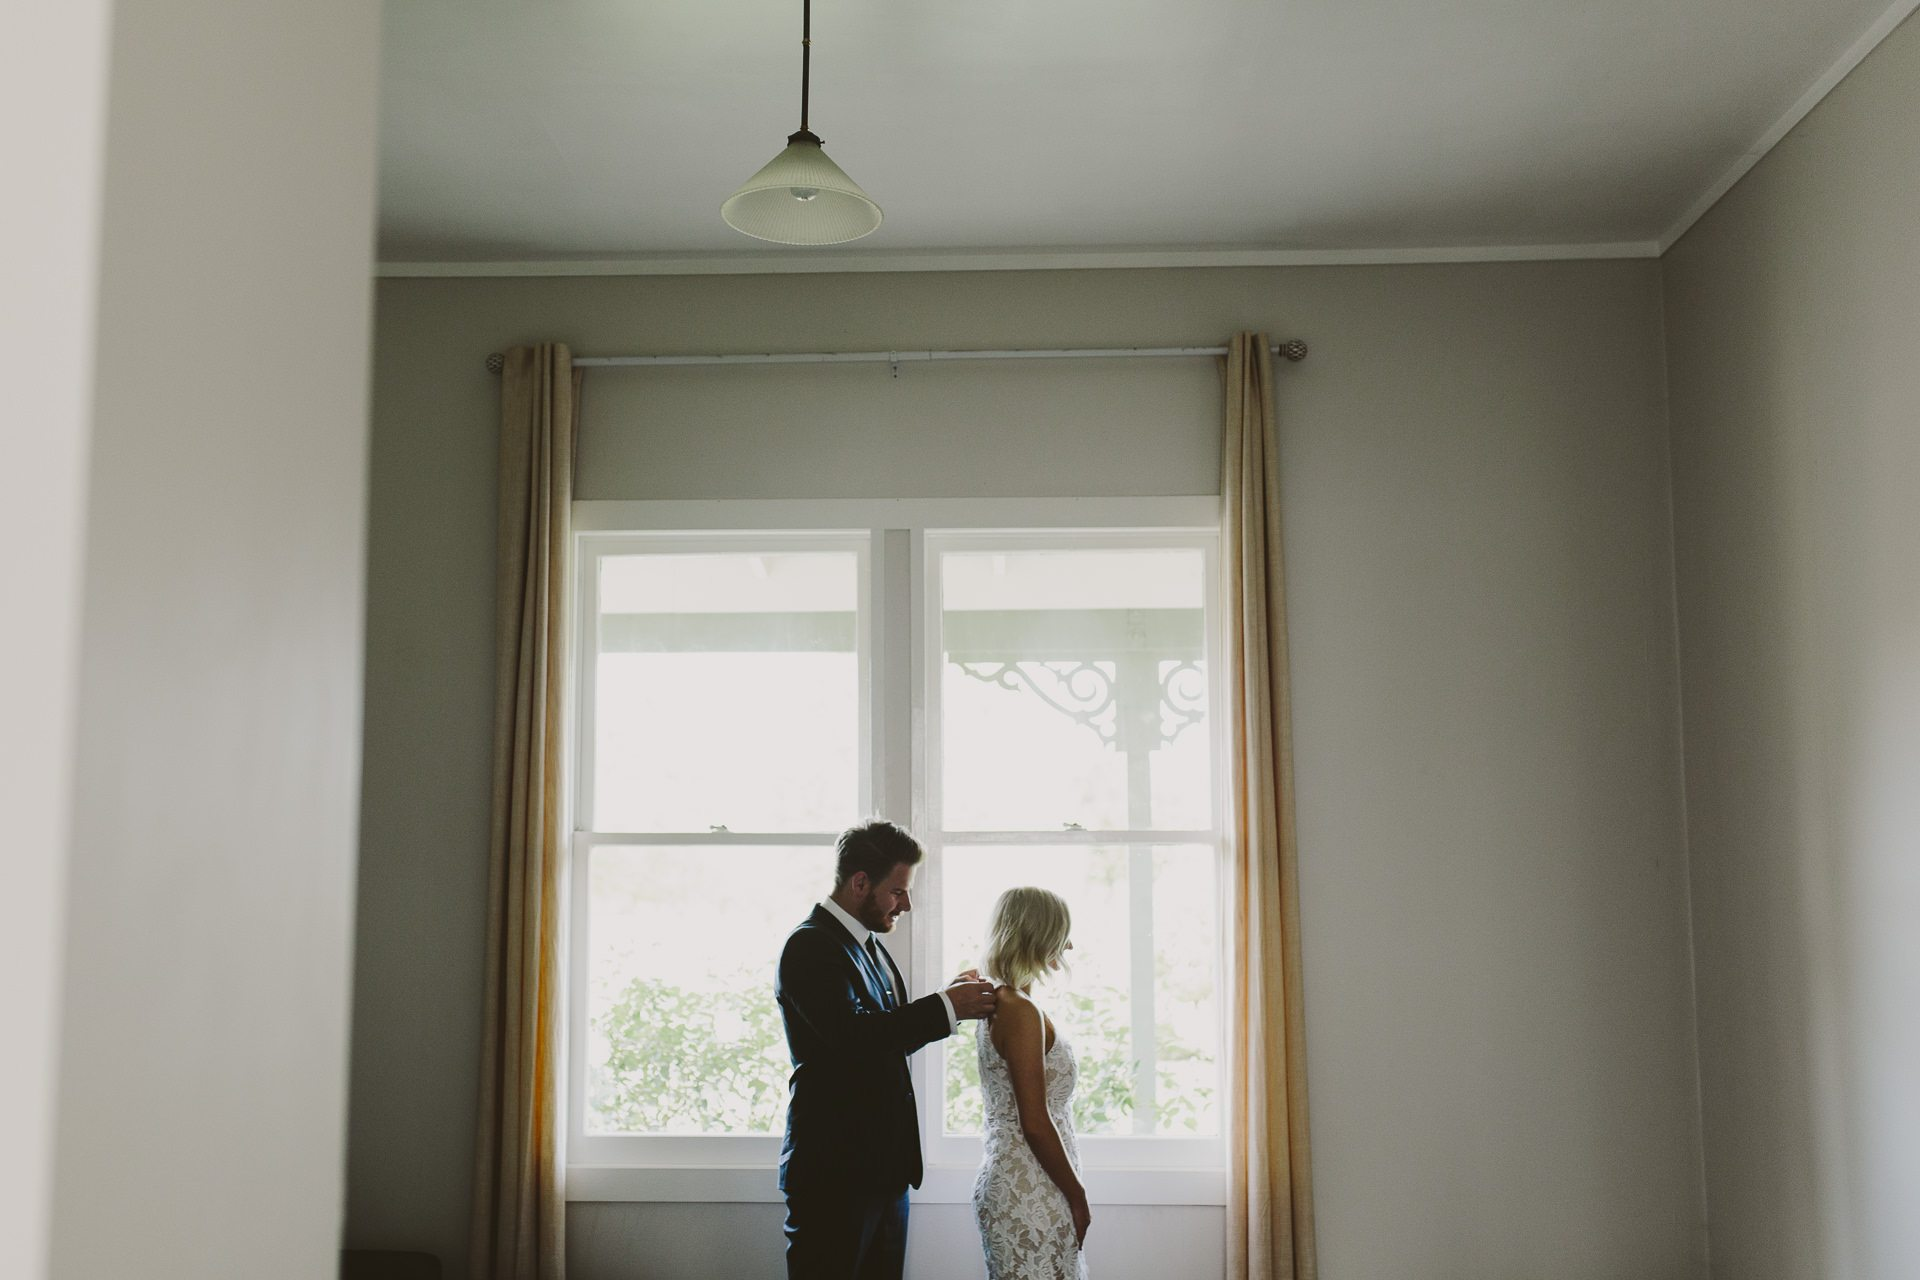 hamilton-wedding-portrait-photographer-at-16